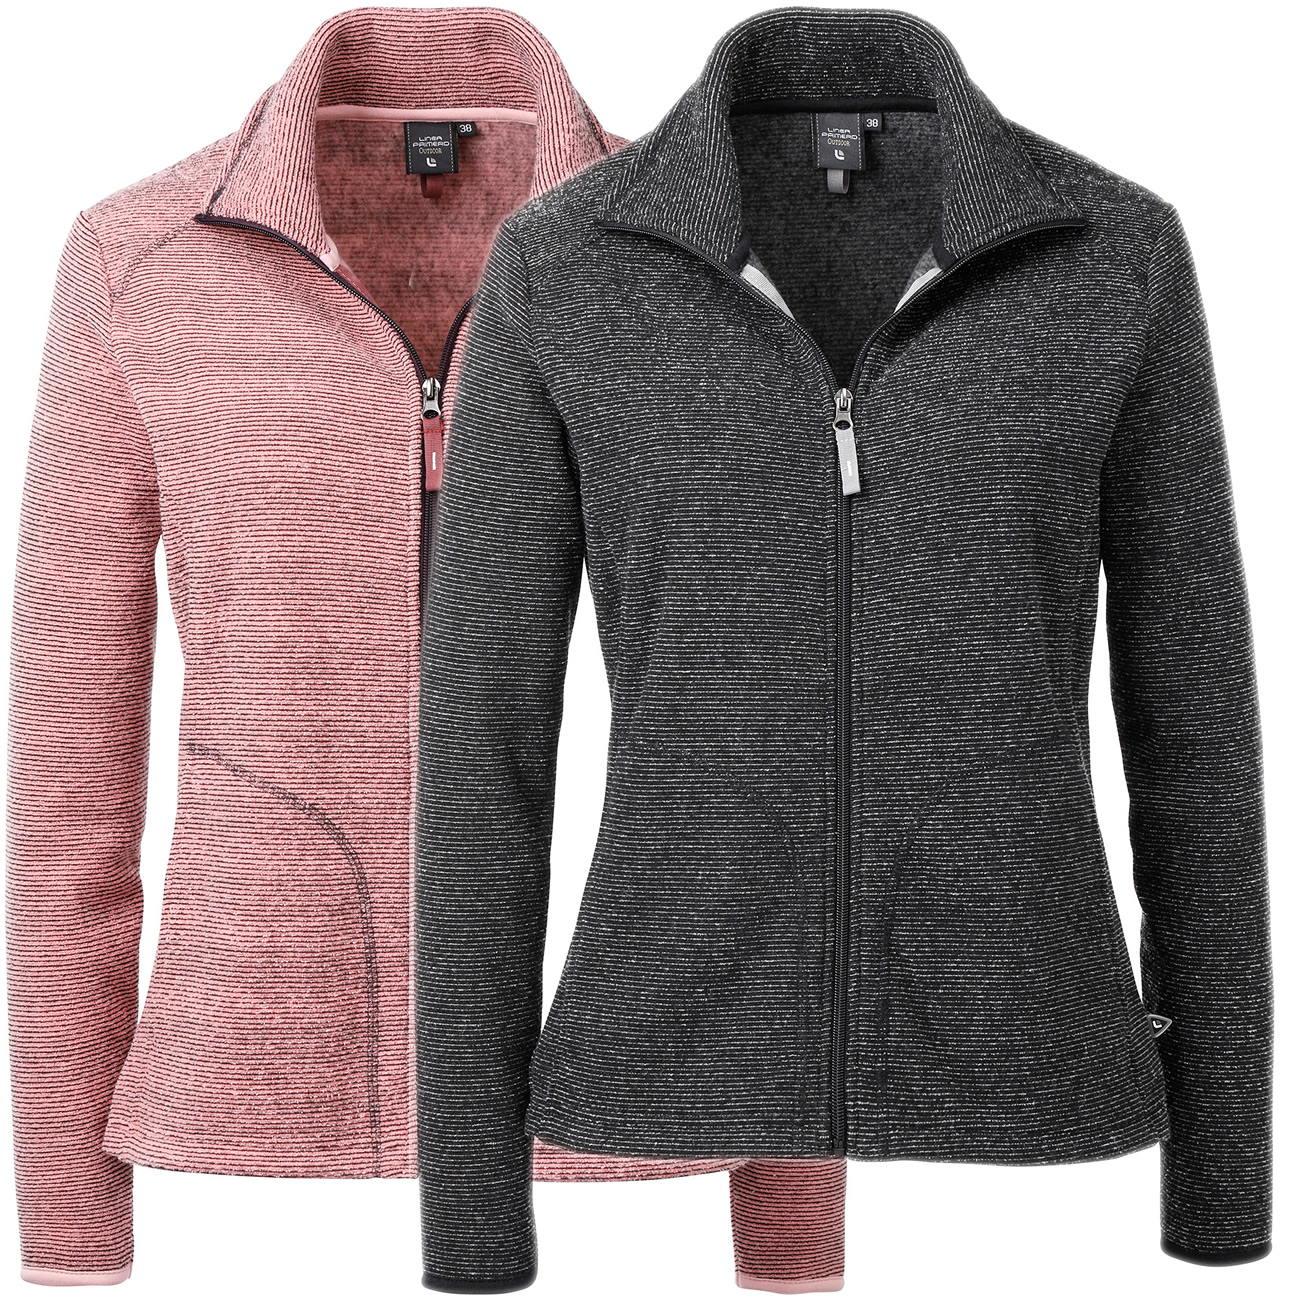 Linea Primero Enya Damen Strickfleece Jacke Große Größen